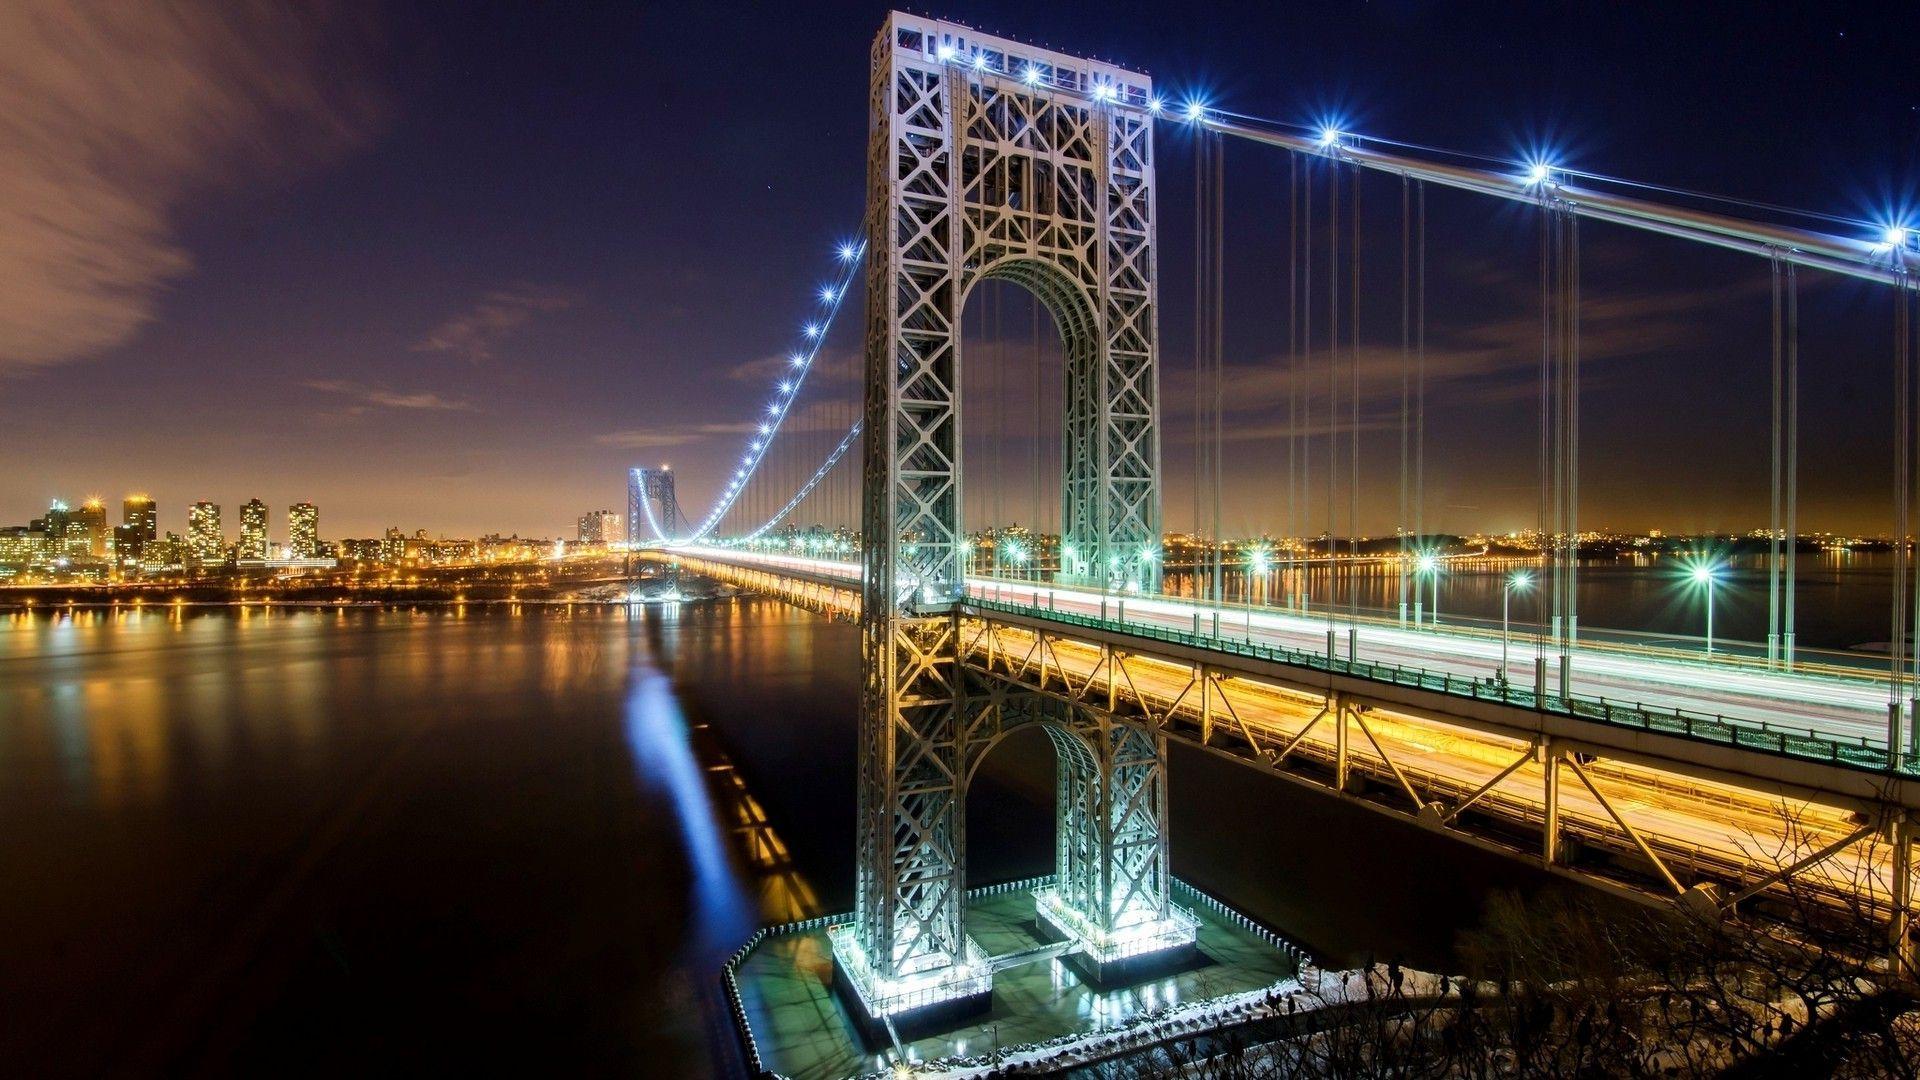 Download George Washington Bridge New York wallpaper 1206175 1920x1080